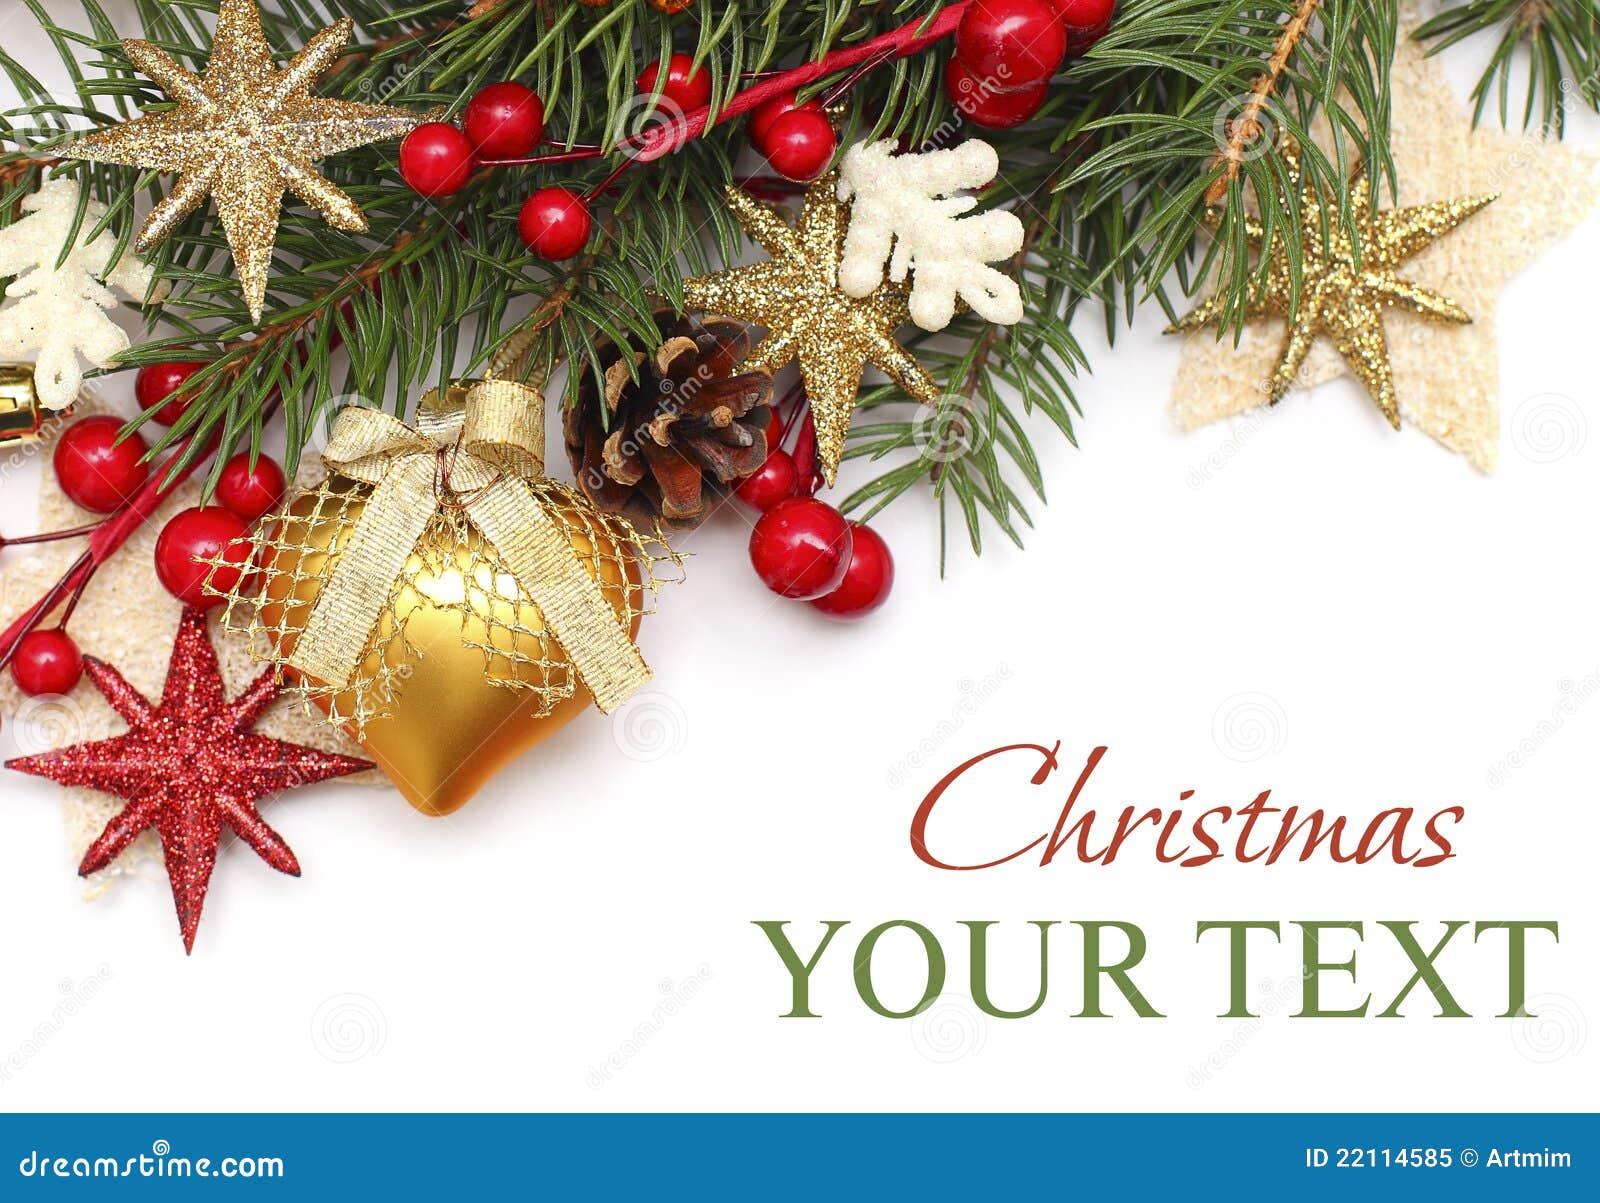 Christmas background with Xmas decoration